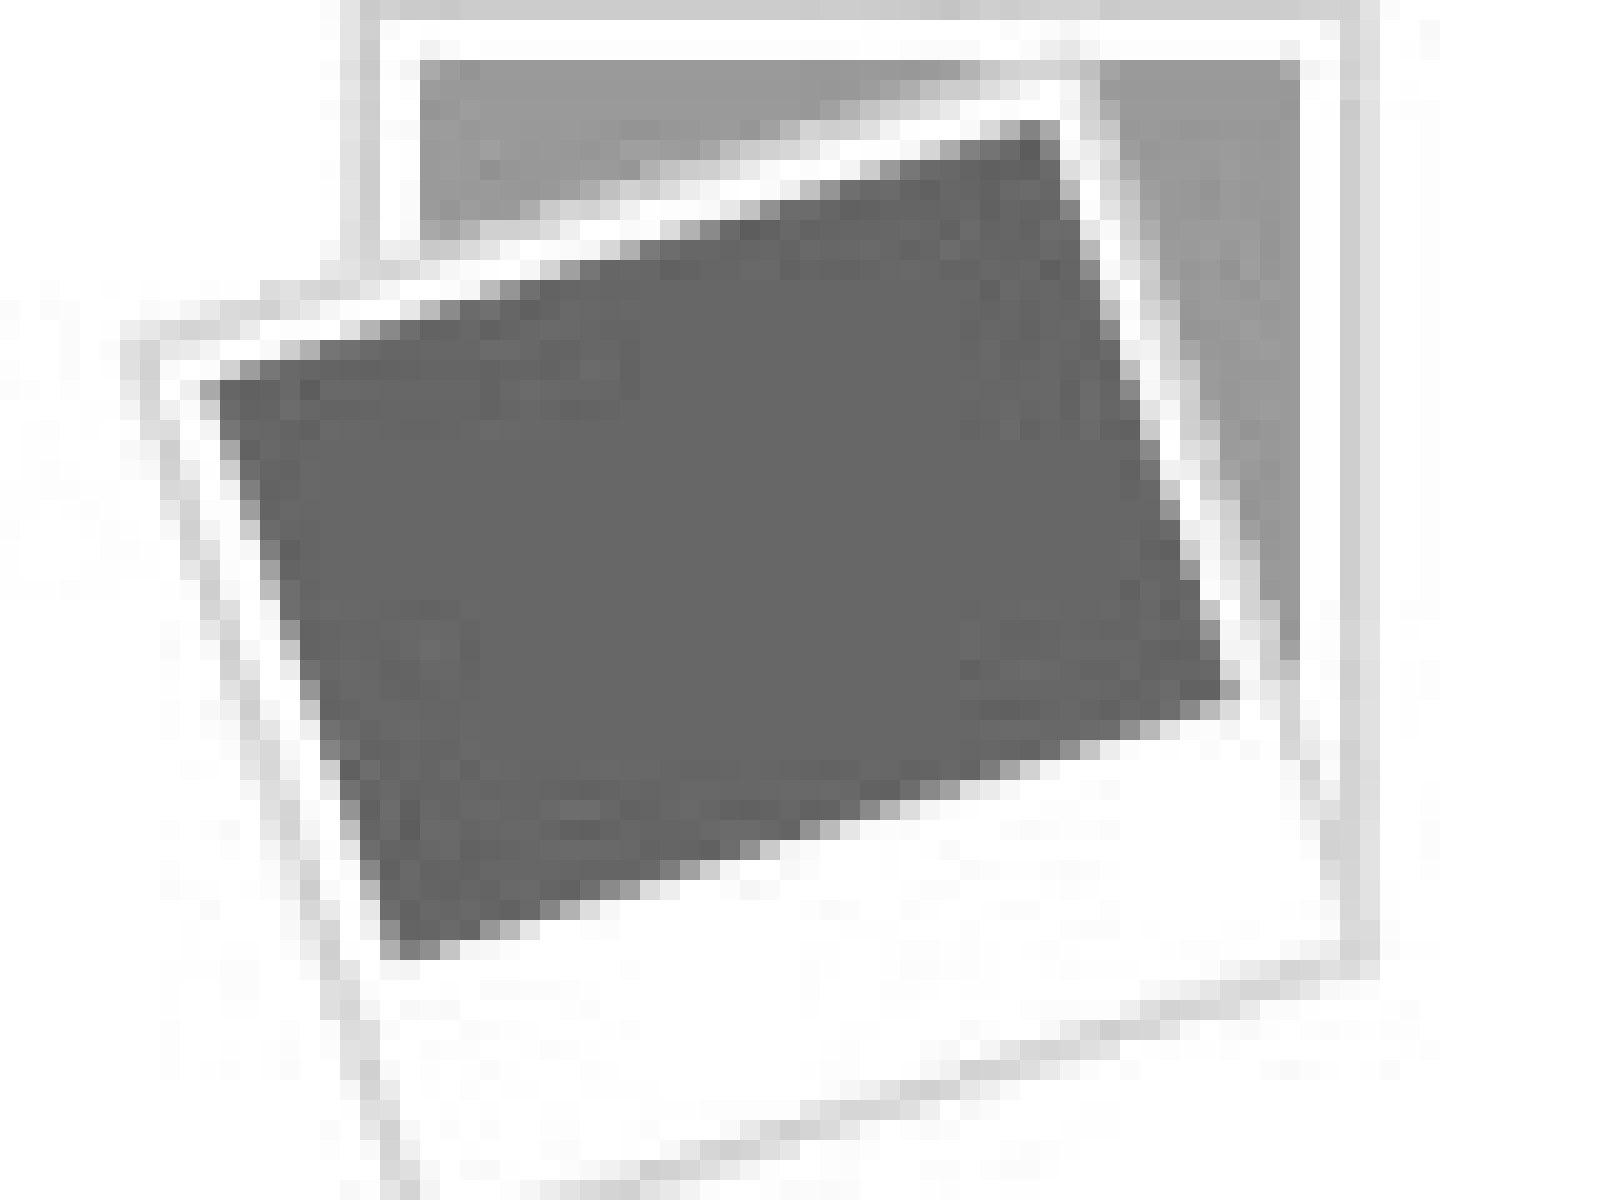 uss archerfish - 1:350 submarine battleship ww2 atlas military war boat 104